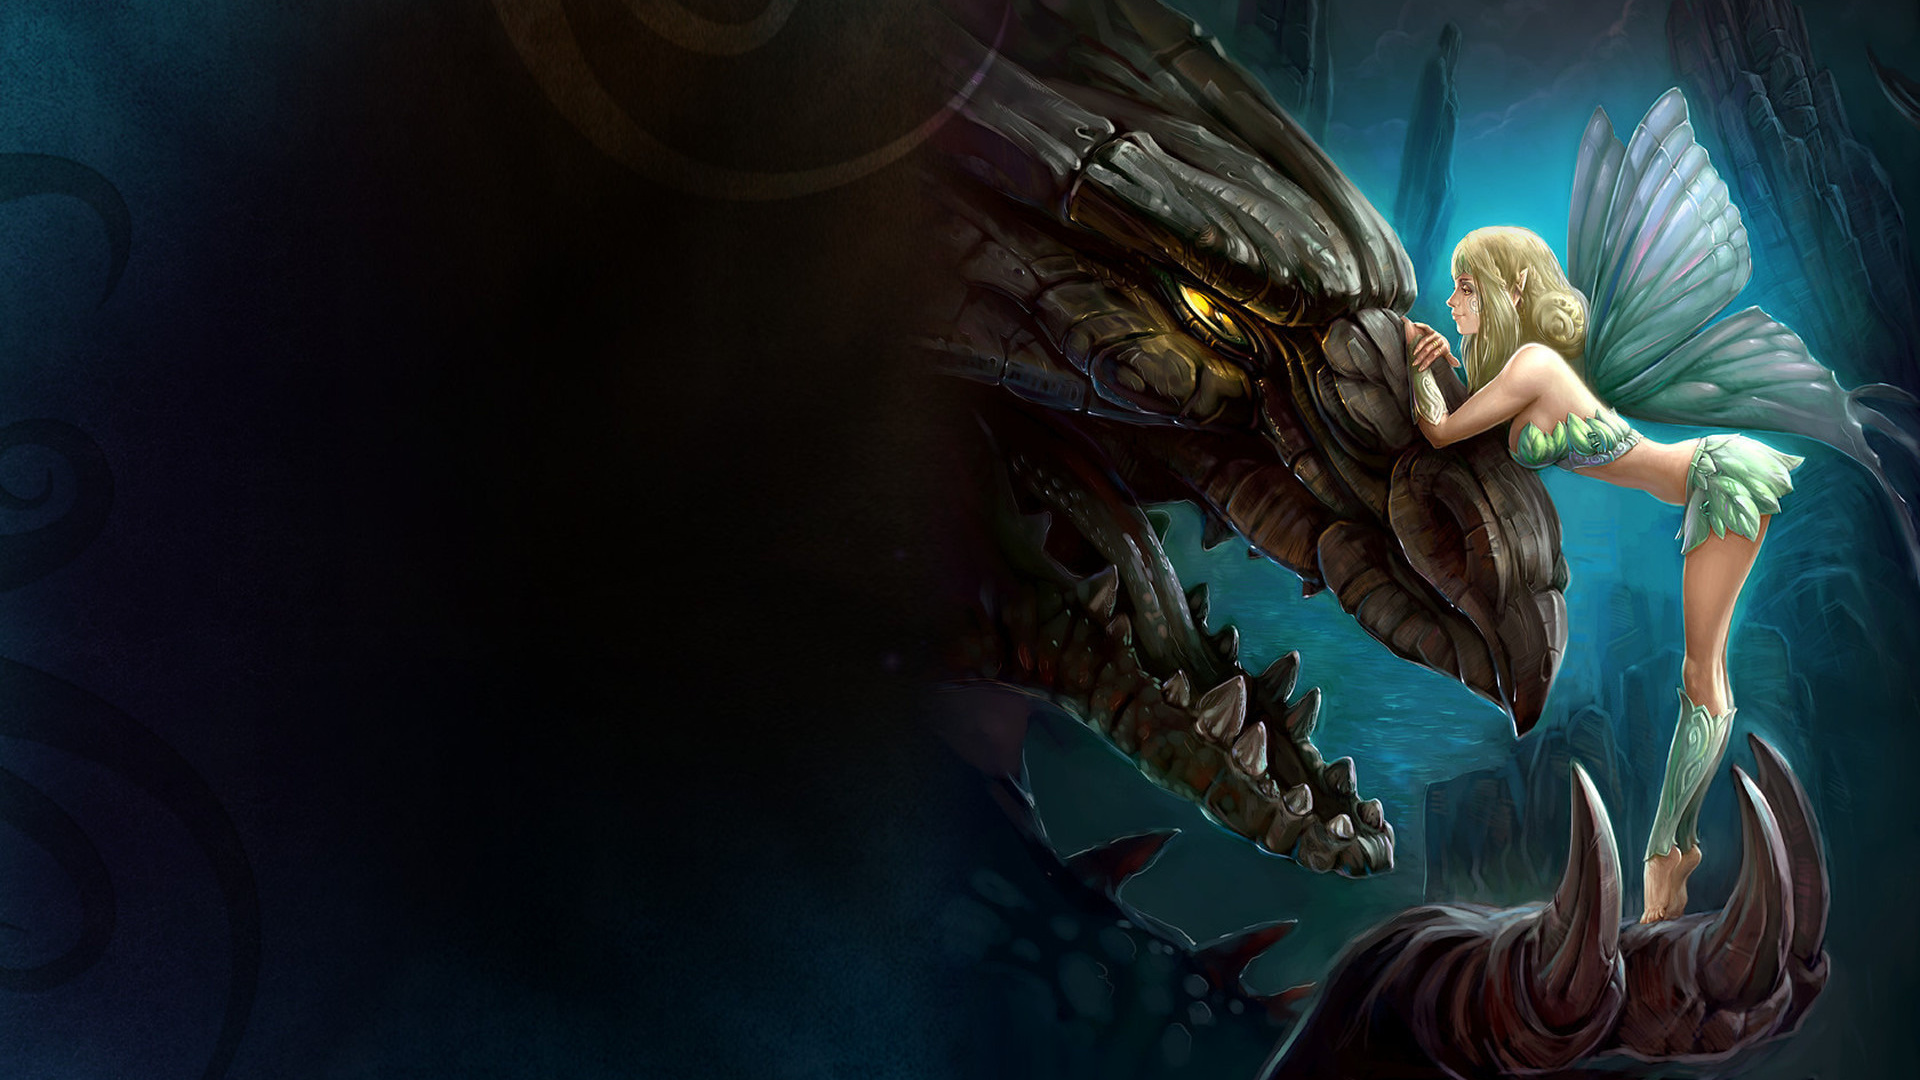 Animated dragons wallpaper